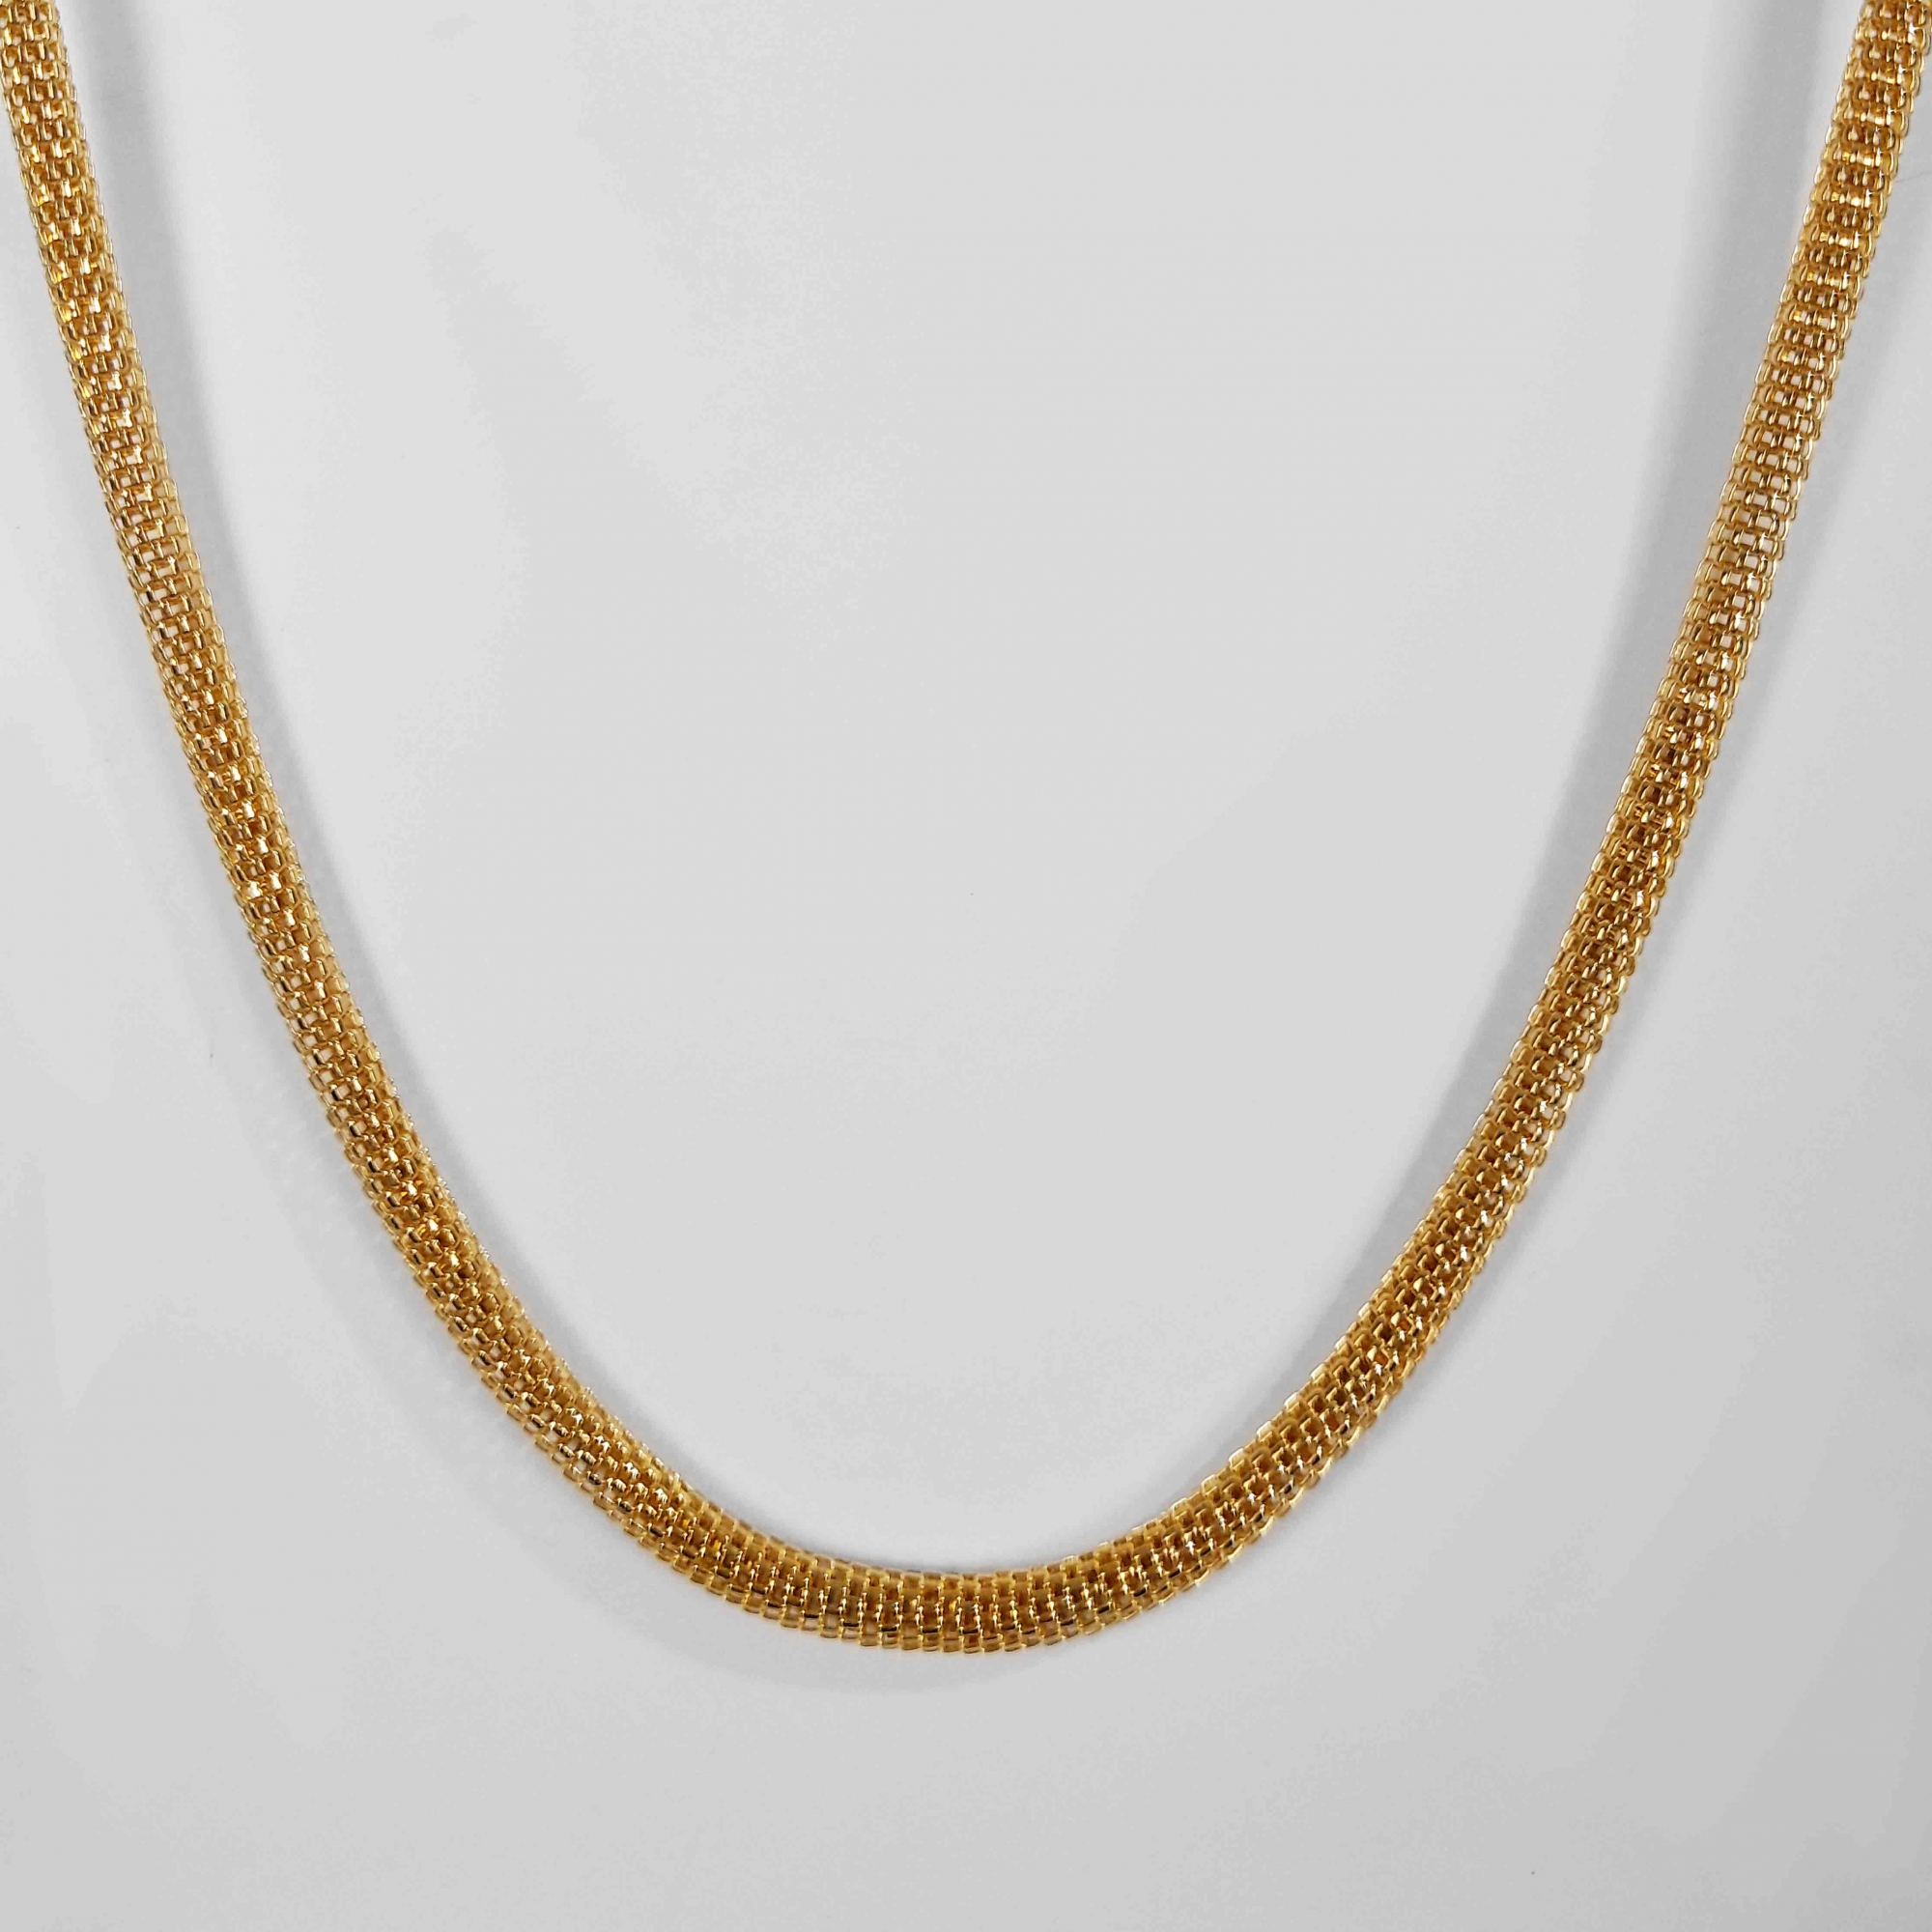 Corrente Malha Italiana Redonda 45cm 4mm Folheado Ouro 18k  - Lunozê Joias